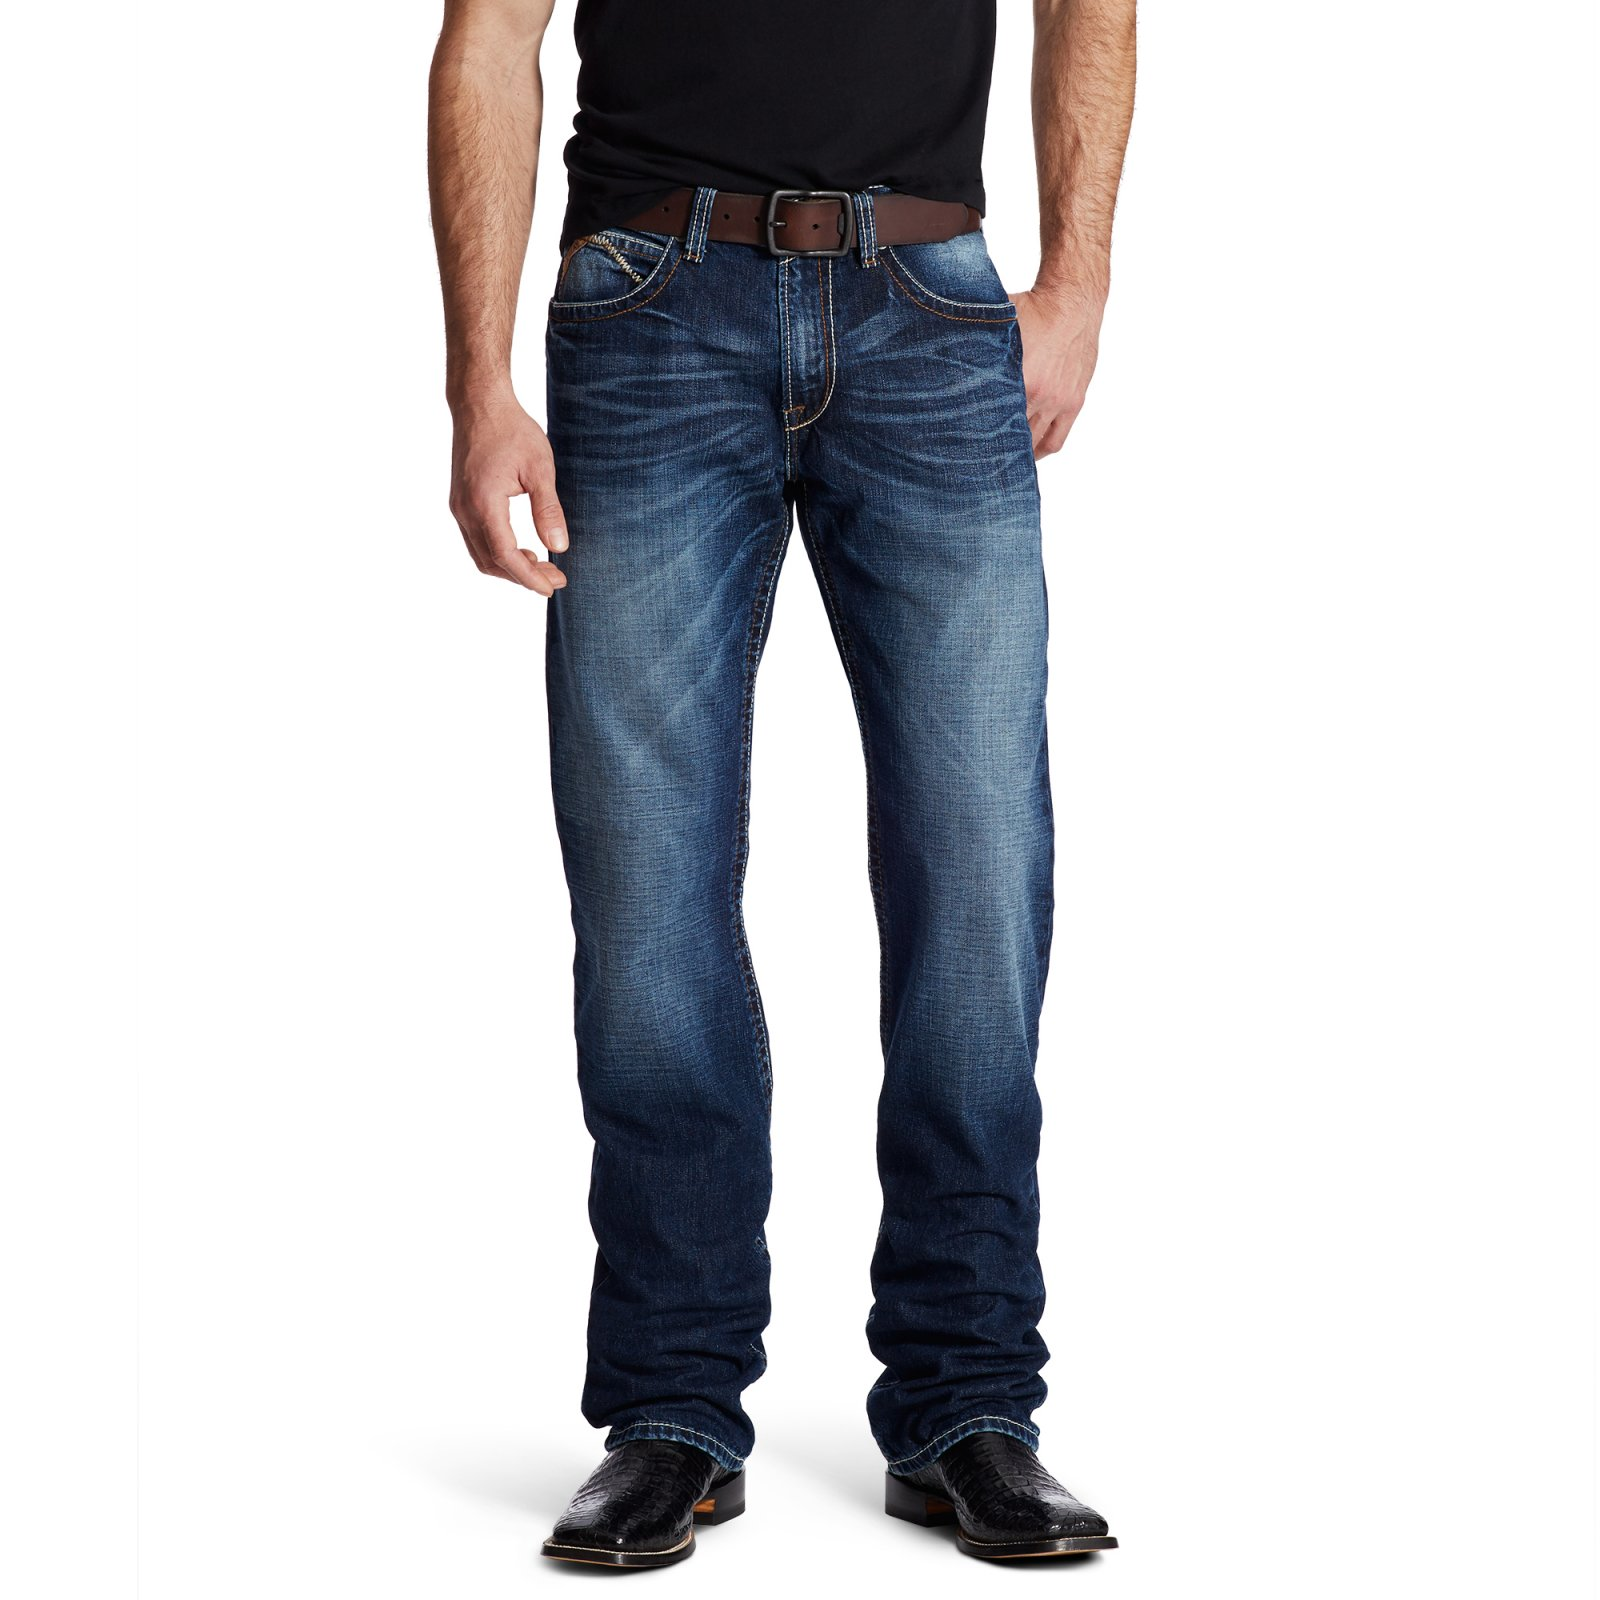 Men's M4 Austin Riverton Jean from Ariat